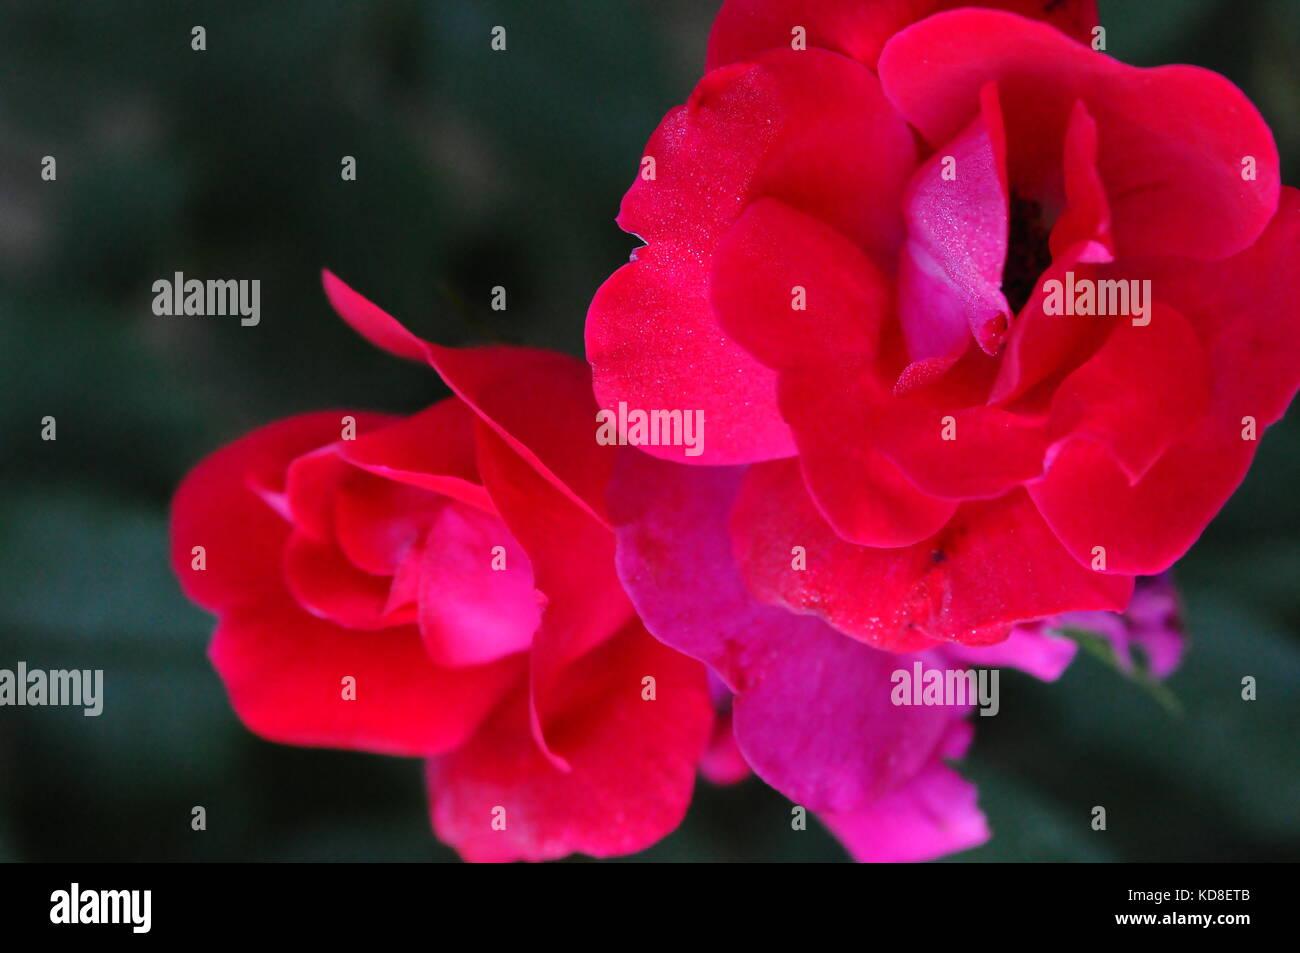 Vibrant Symbol of Love - Stock Image